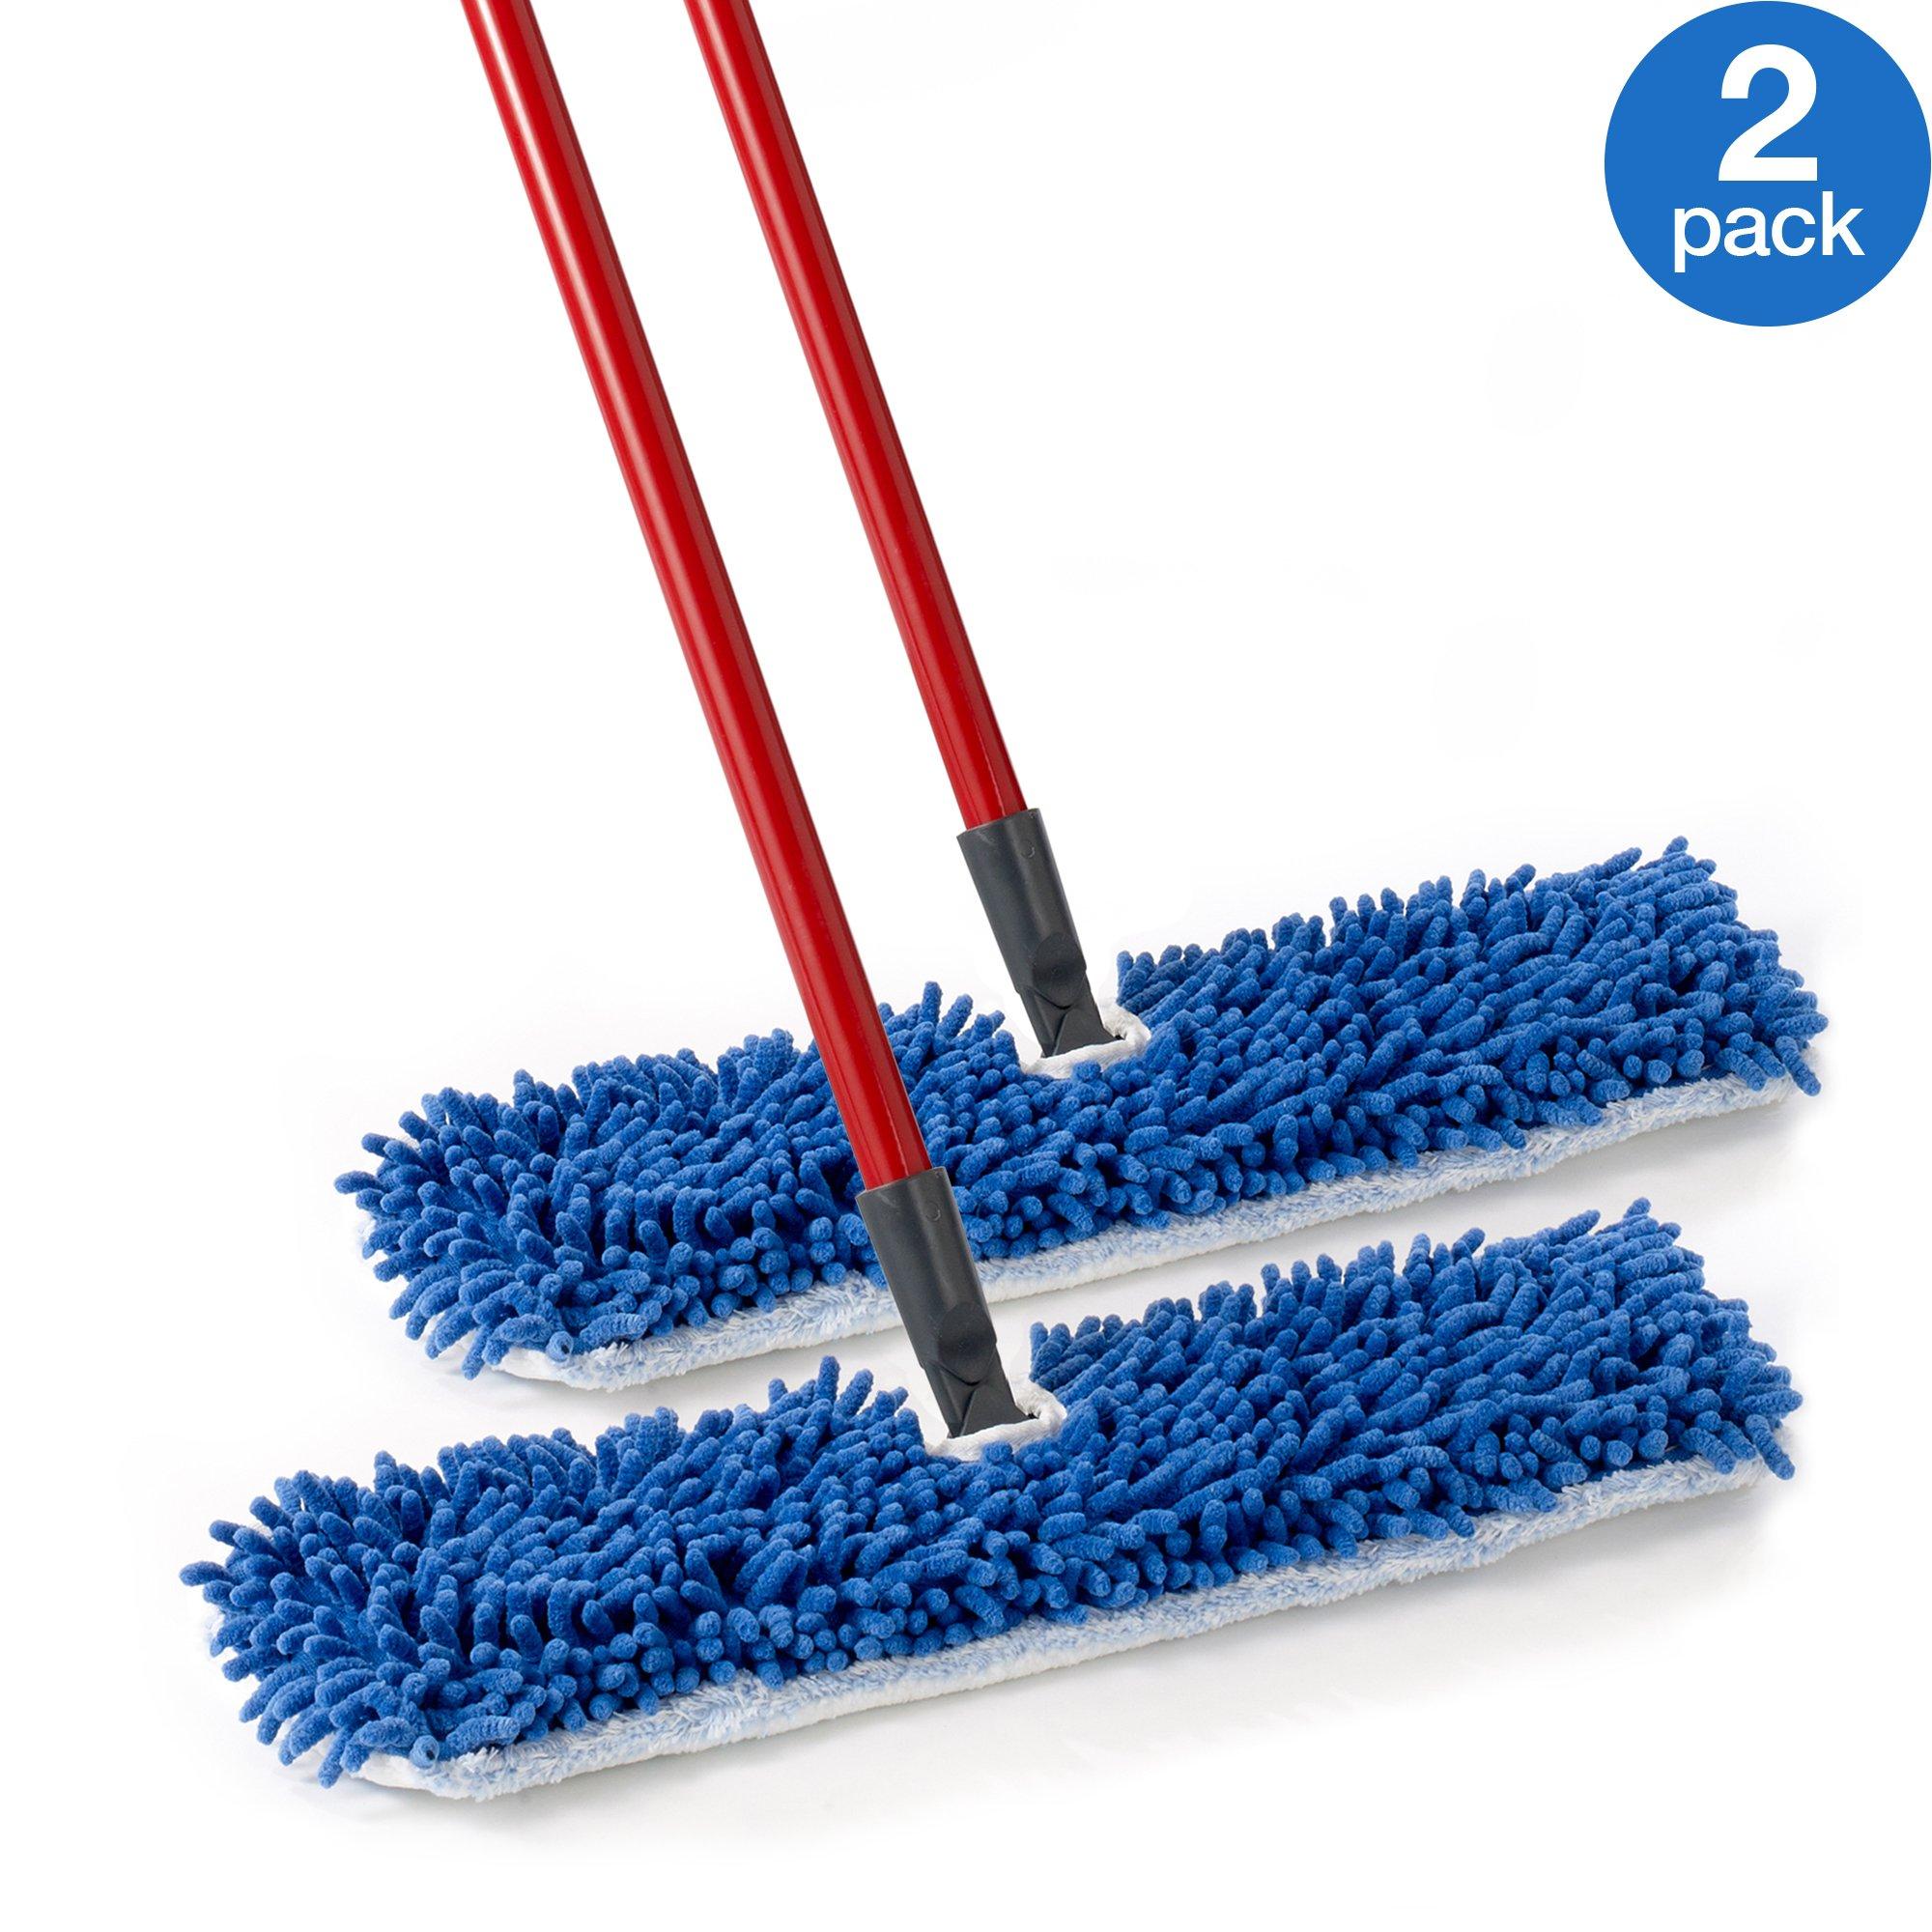 O-Cedar Dual Action Microfiber Flip Mop Damp Dry All Surface Mop, 1 CT